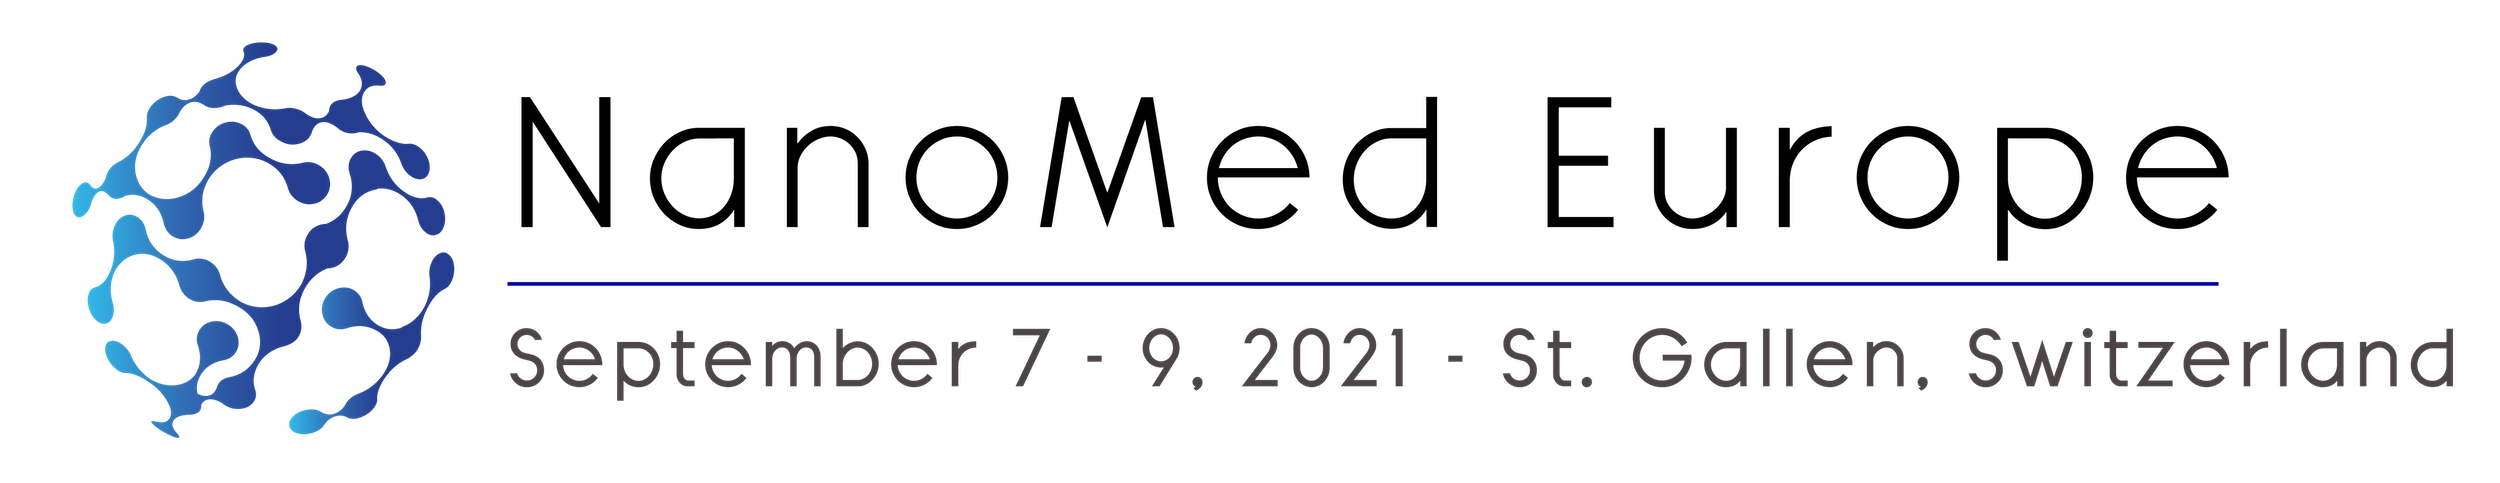 Nanomed Europe 2021